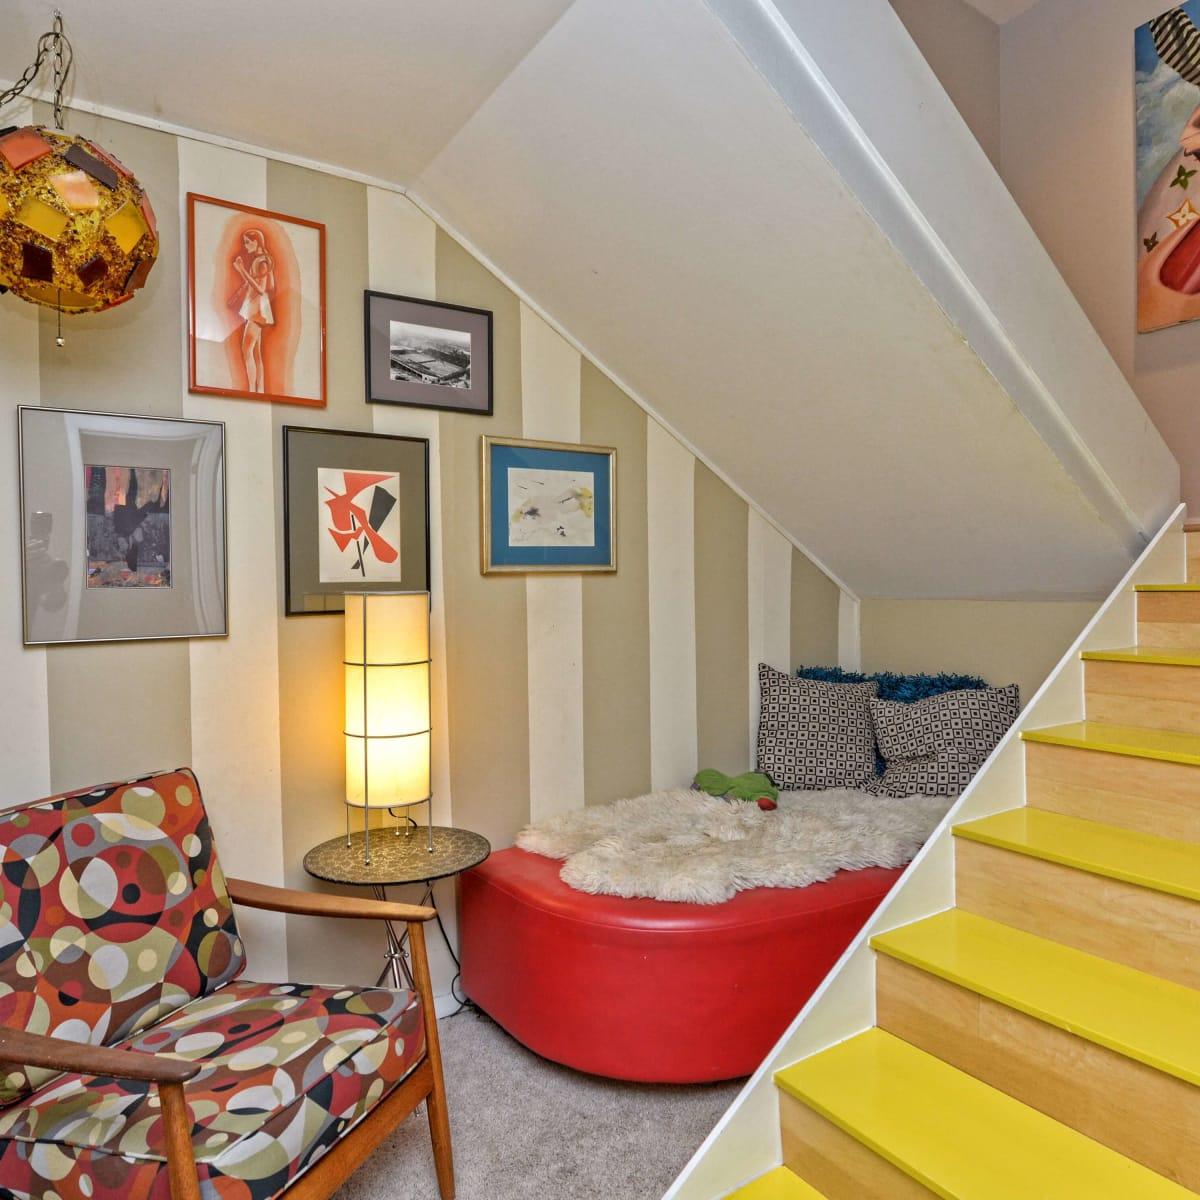 Austin home house 5932 Highland Hills Dr 78731 study niche staircase